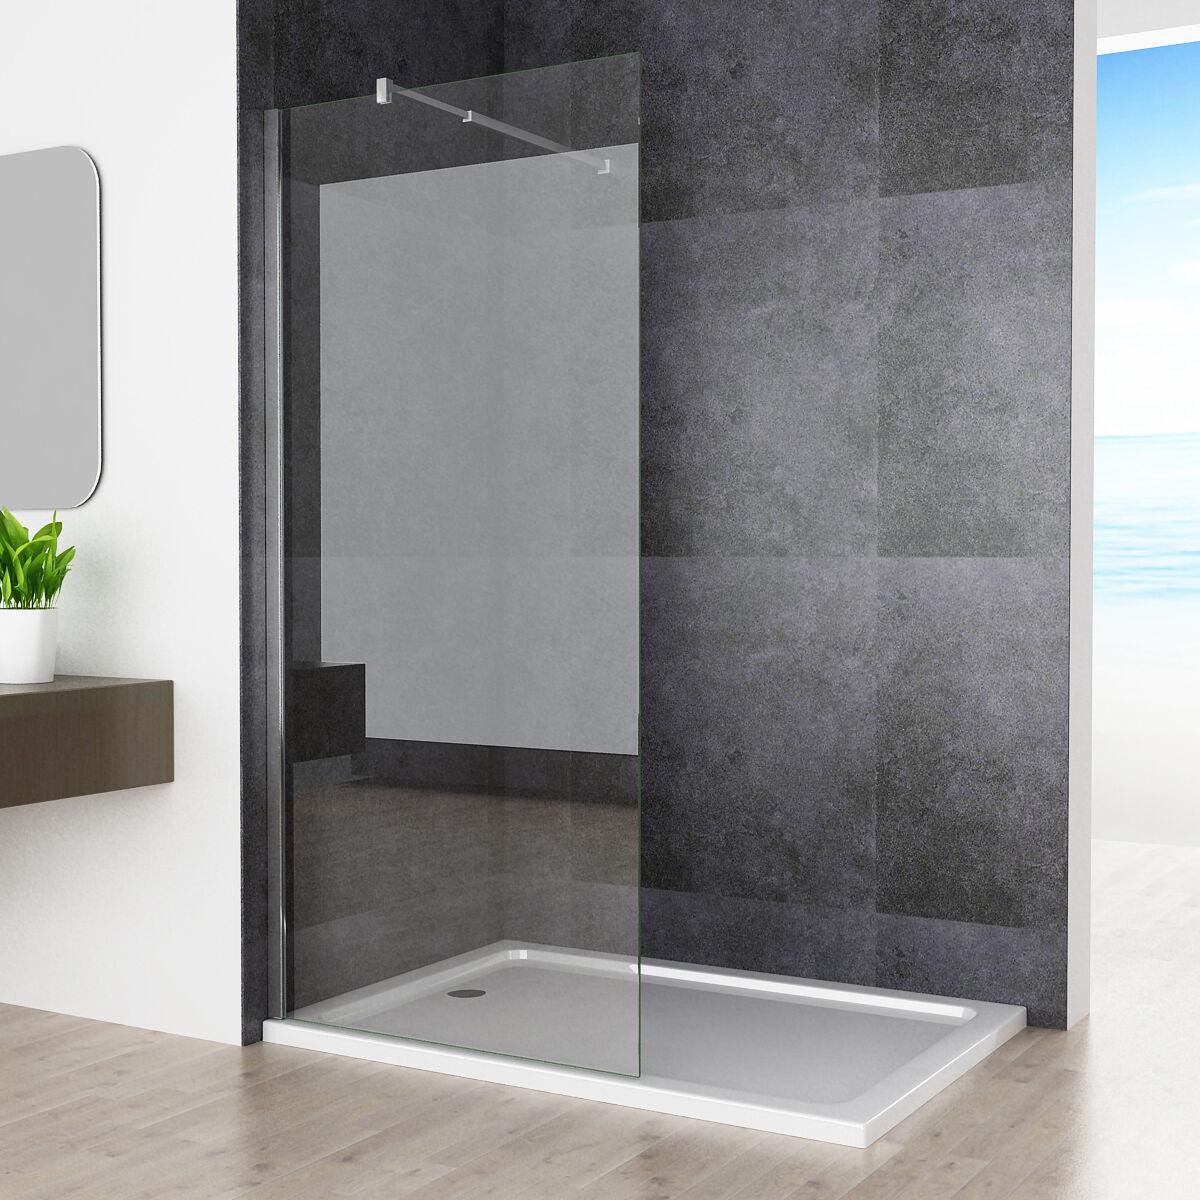 80 x 200cm walk in dusche duschabtrennung duschwand. Black Bedroom Furniture Sets. Home Design Ideas